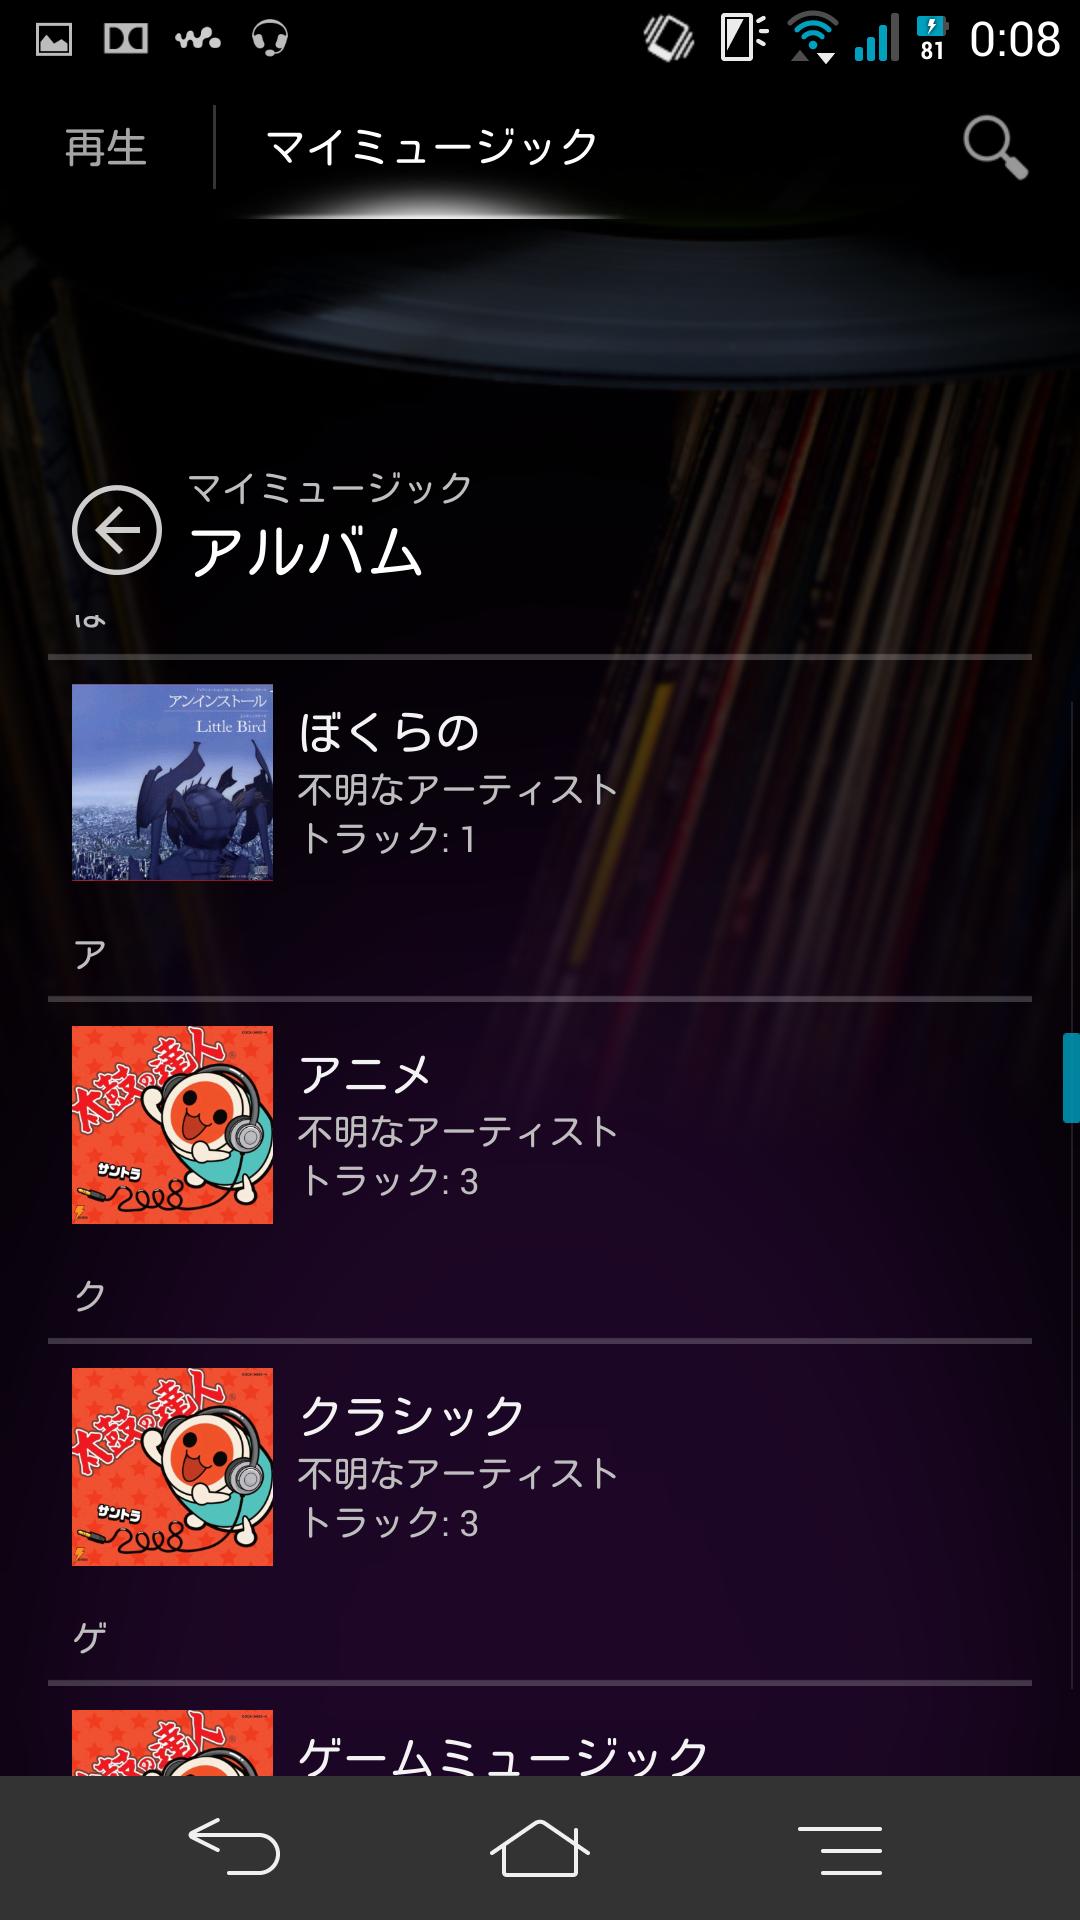 Screenshot_2014-08-12-00-08-47.png